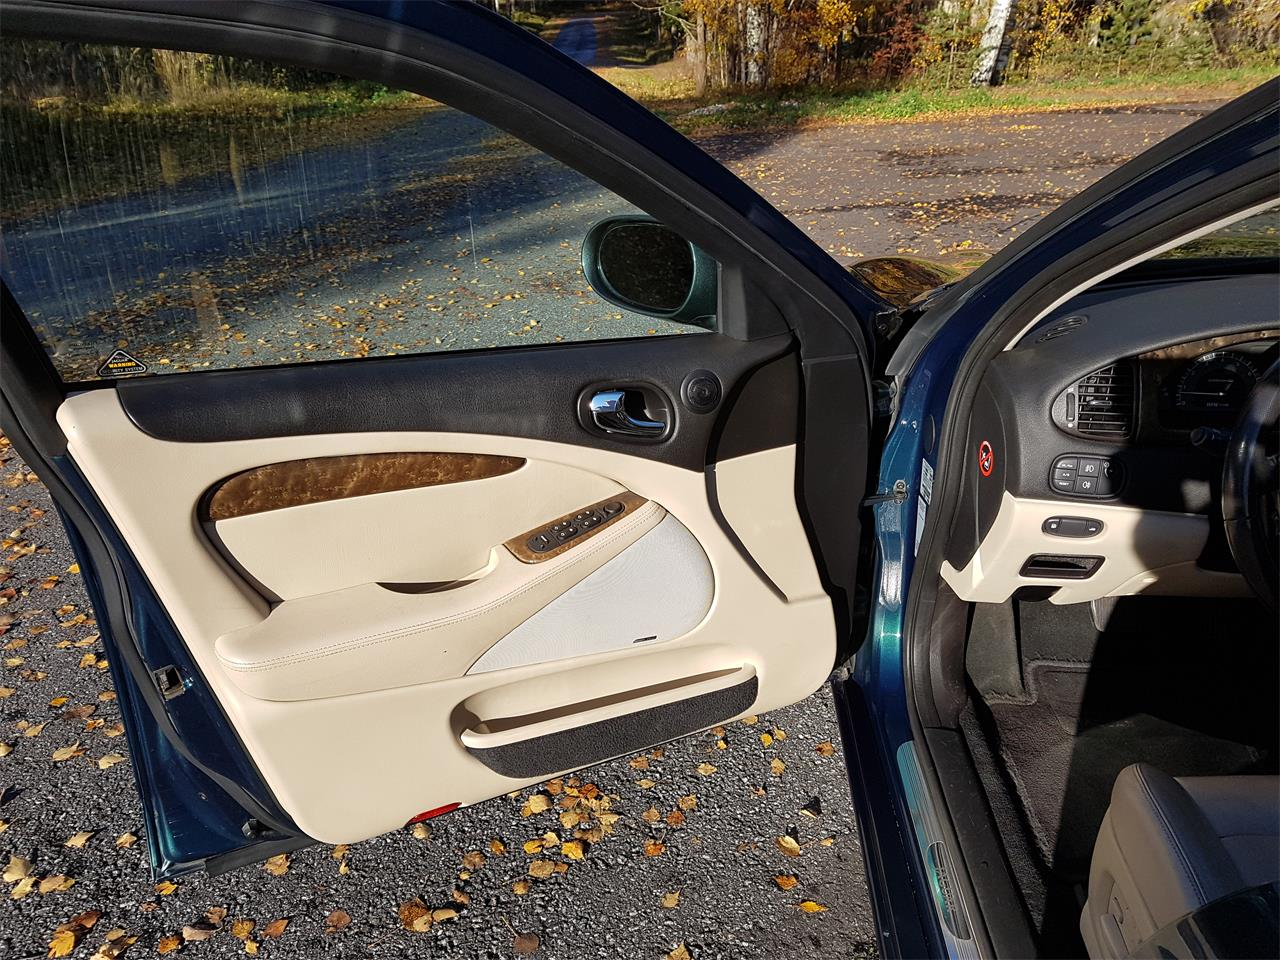 2003 Jaguar S-Type (CC-1302205) for sale in Luumaki, Luumaki